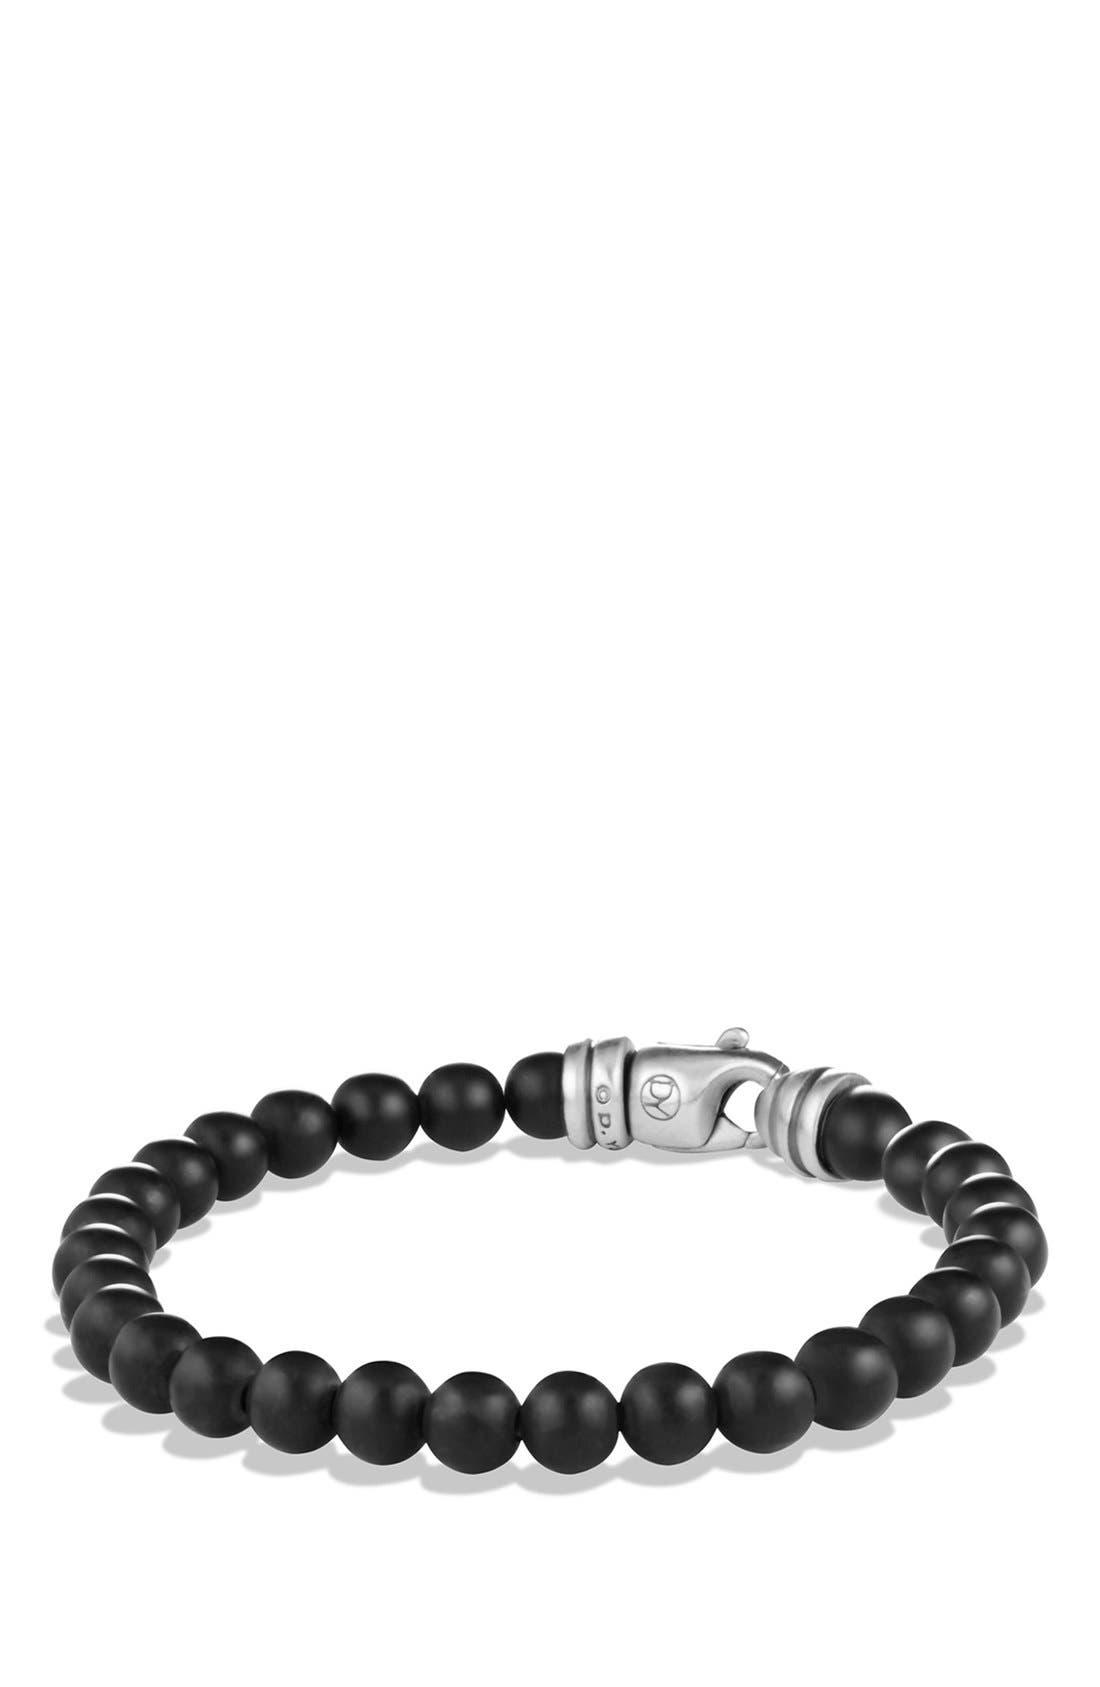 DAVID YURMAN 'Spiritual Beads' Bracelet, Main, color, BLACK ONYX